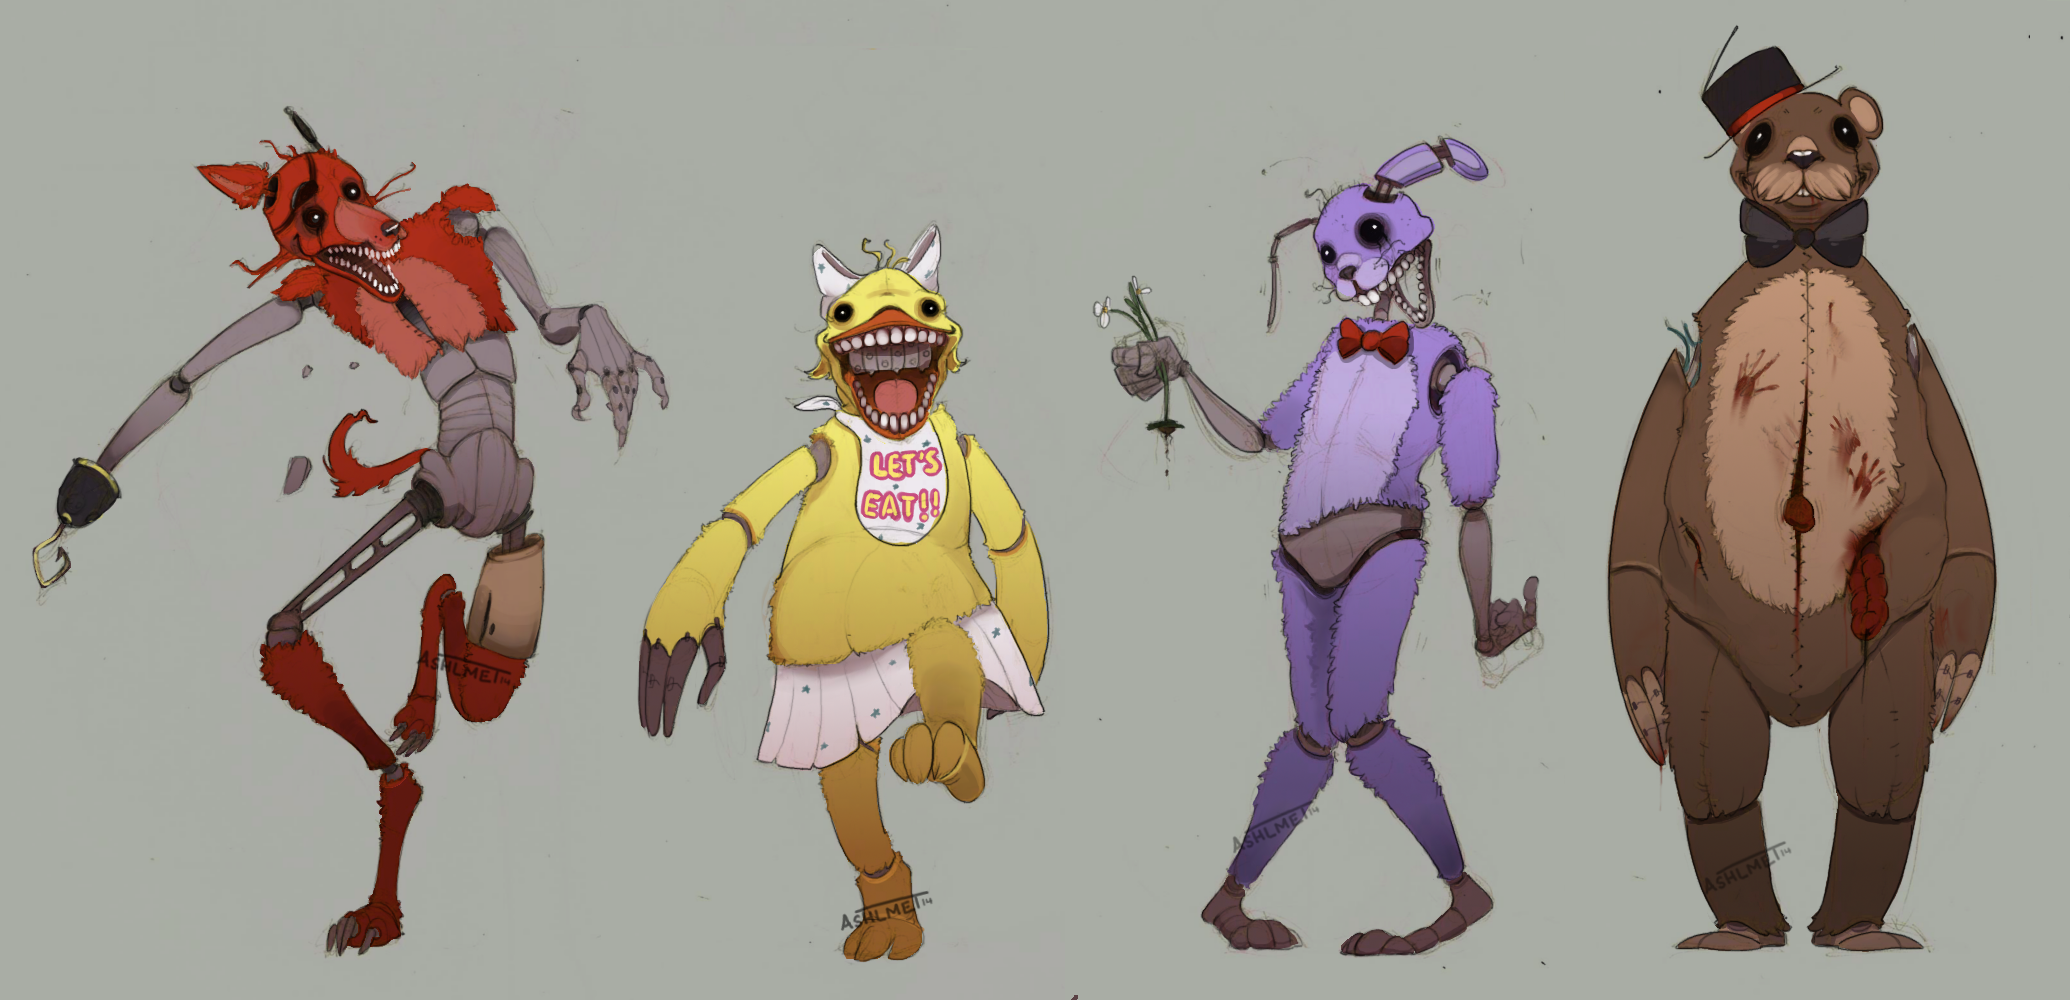 LETS GAT 4 MAGFest Swiper Fictional Character